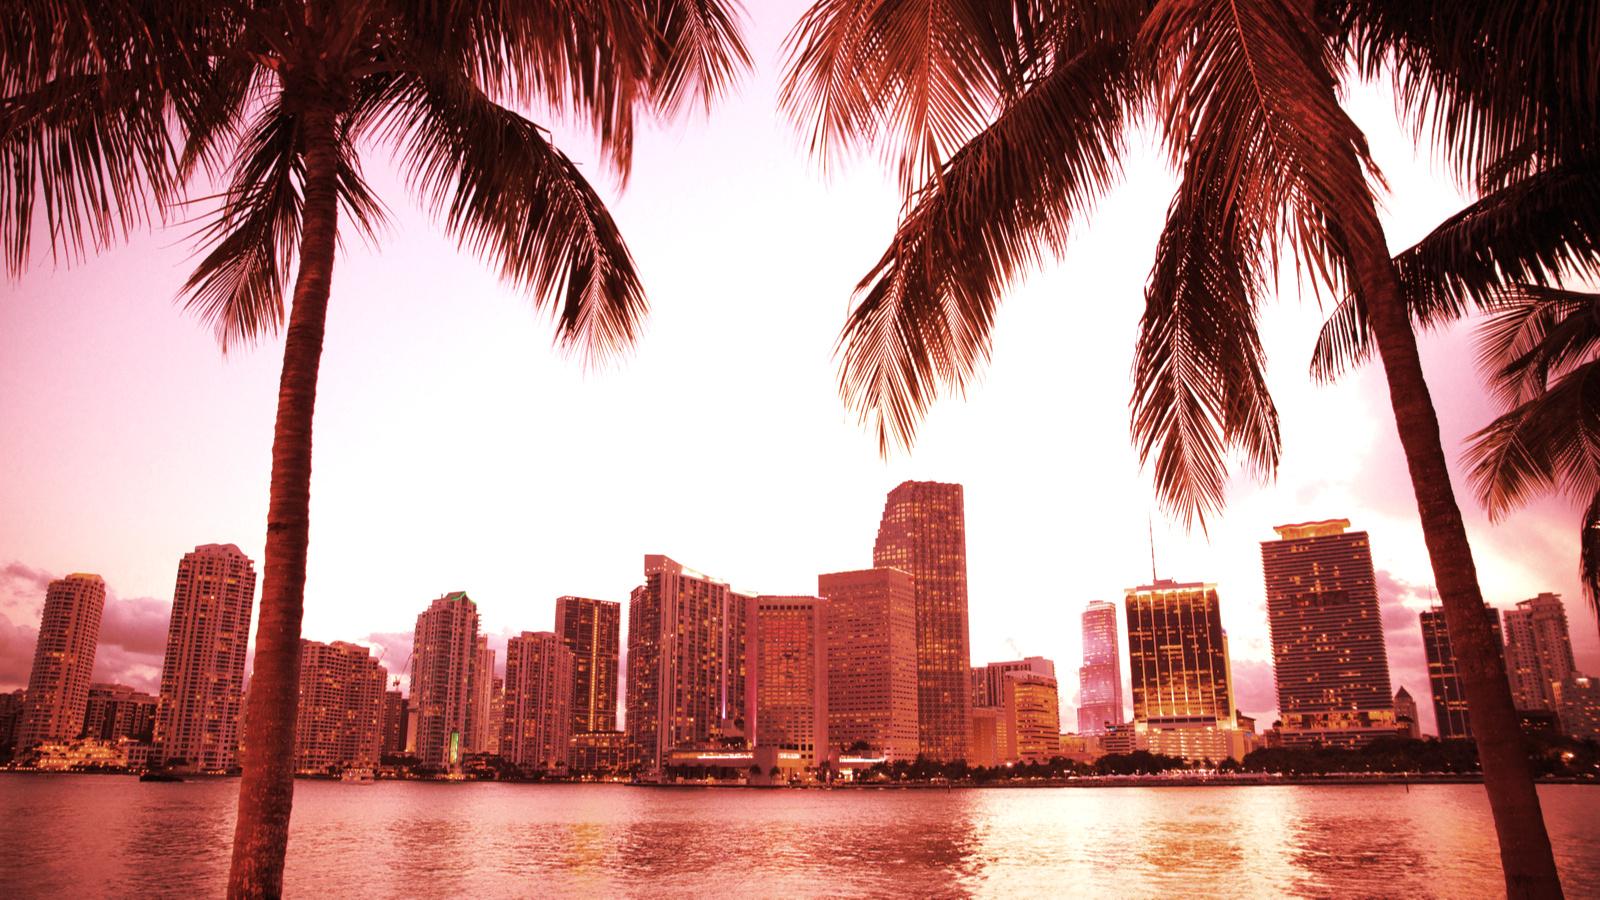 'City-Centric' Crypto MiamiCoin Nets $7.8 Million for City of Miami